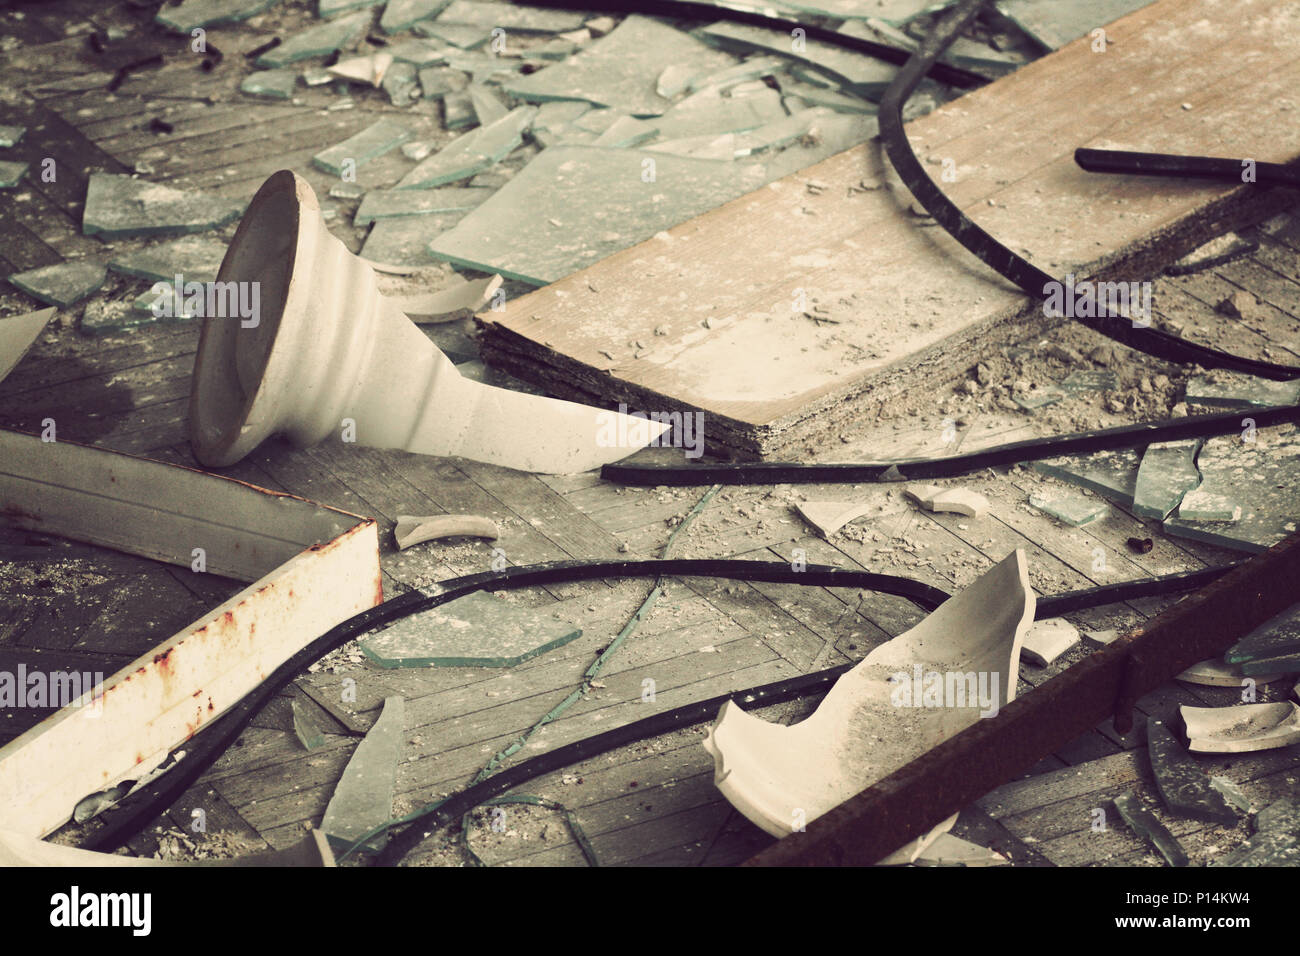 Abandoned City of Pripyat, Chernobyl, Ukraine. - Stock Image